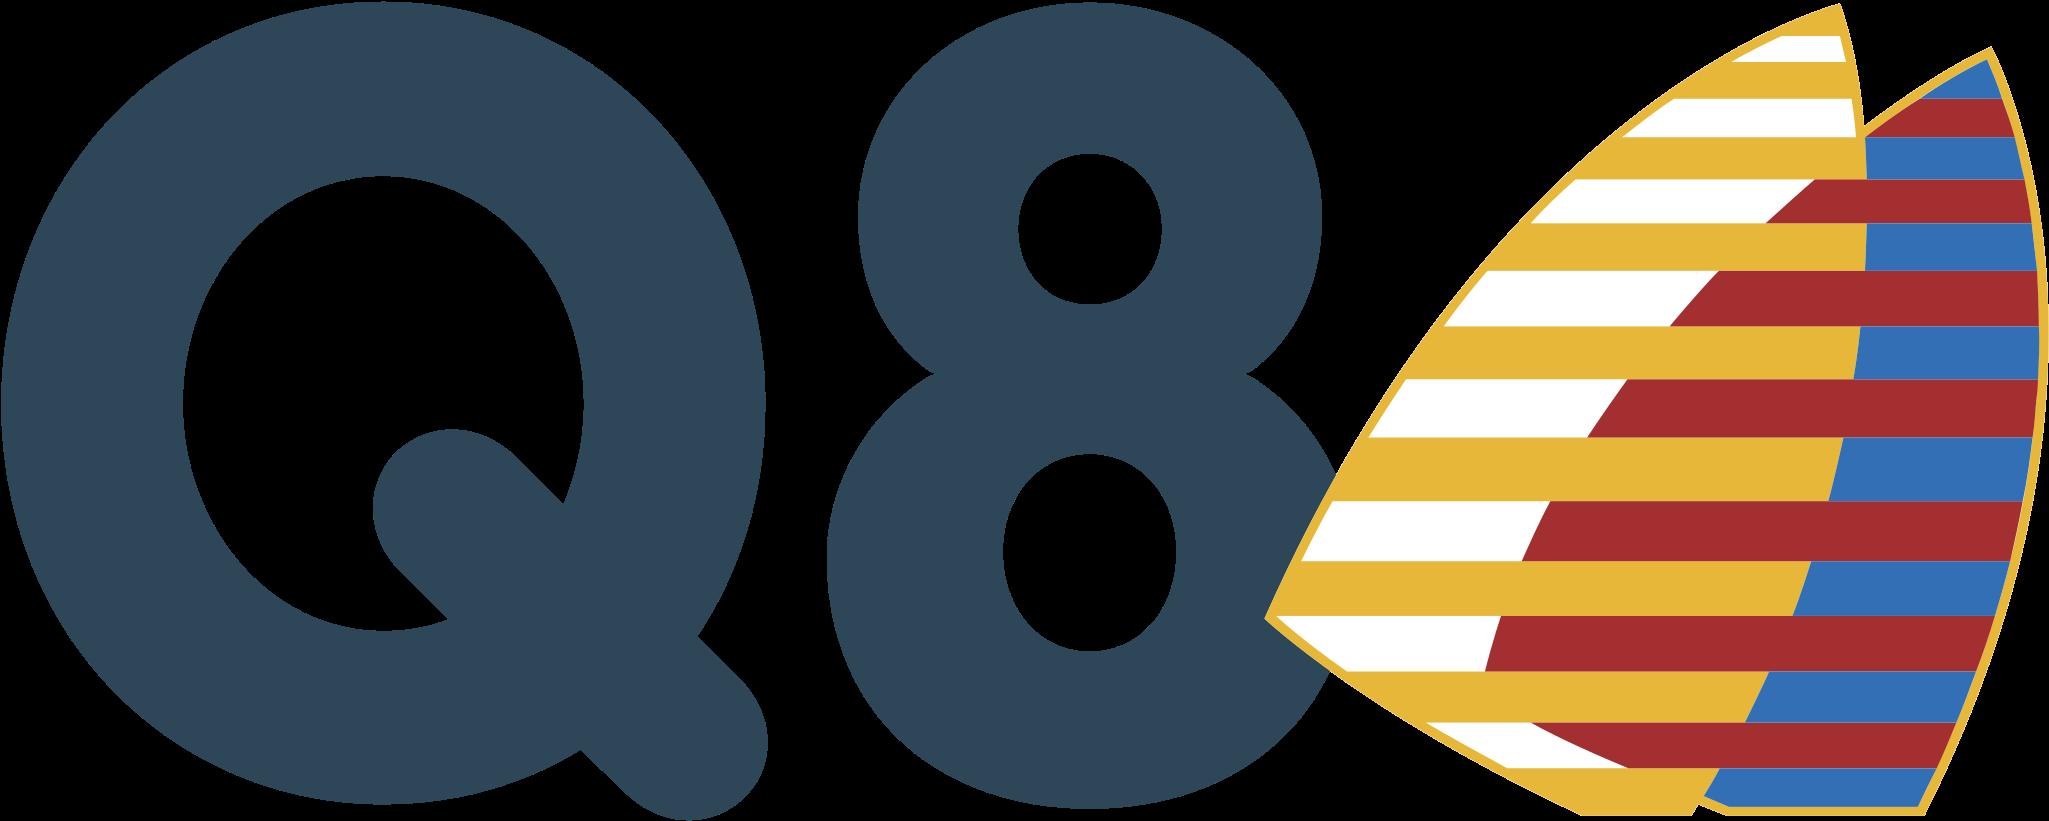 Download HD Q8 Logo Png Transparent - Kuwait Petroleum